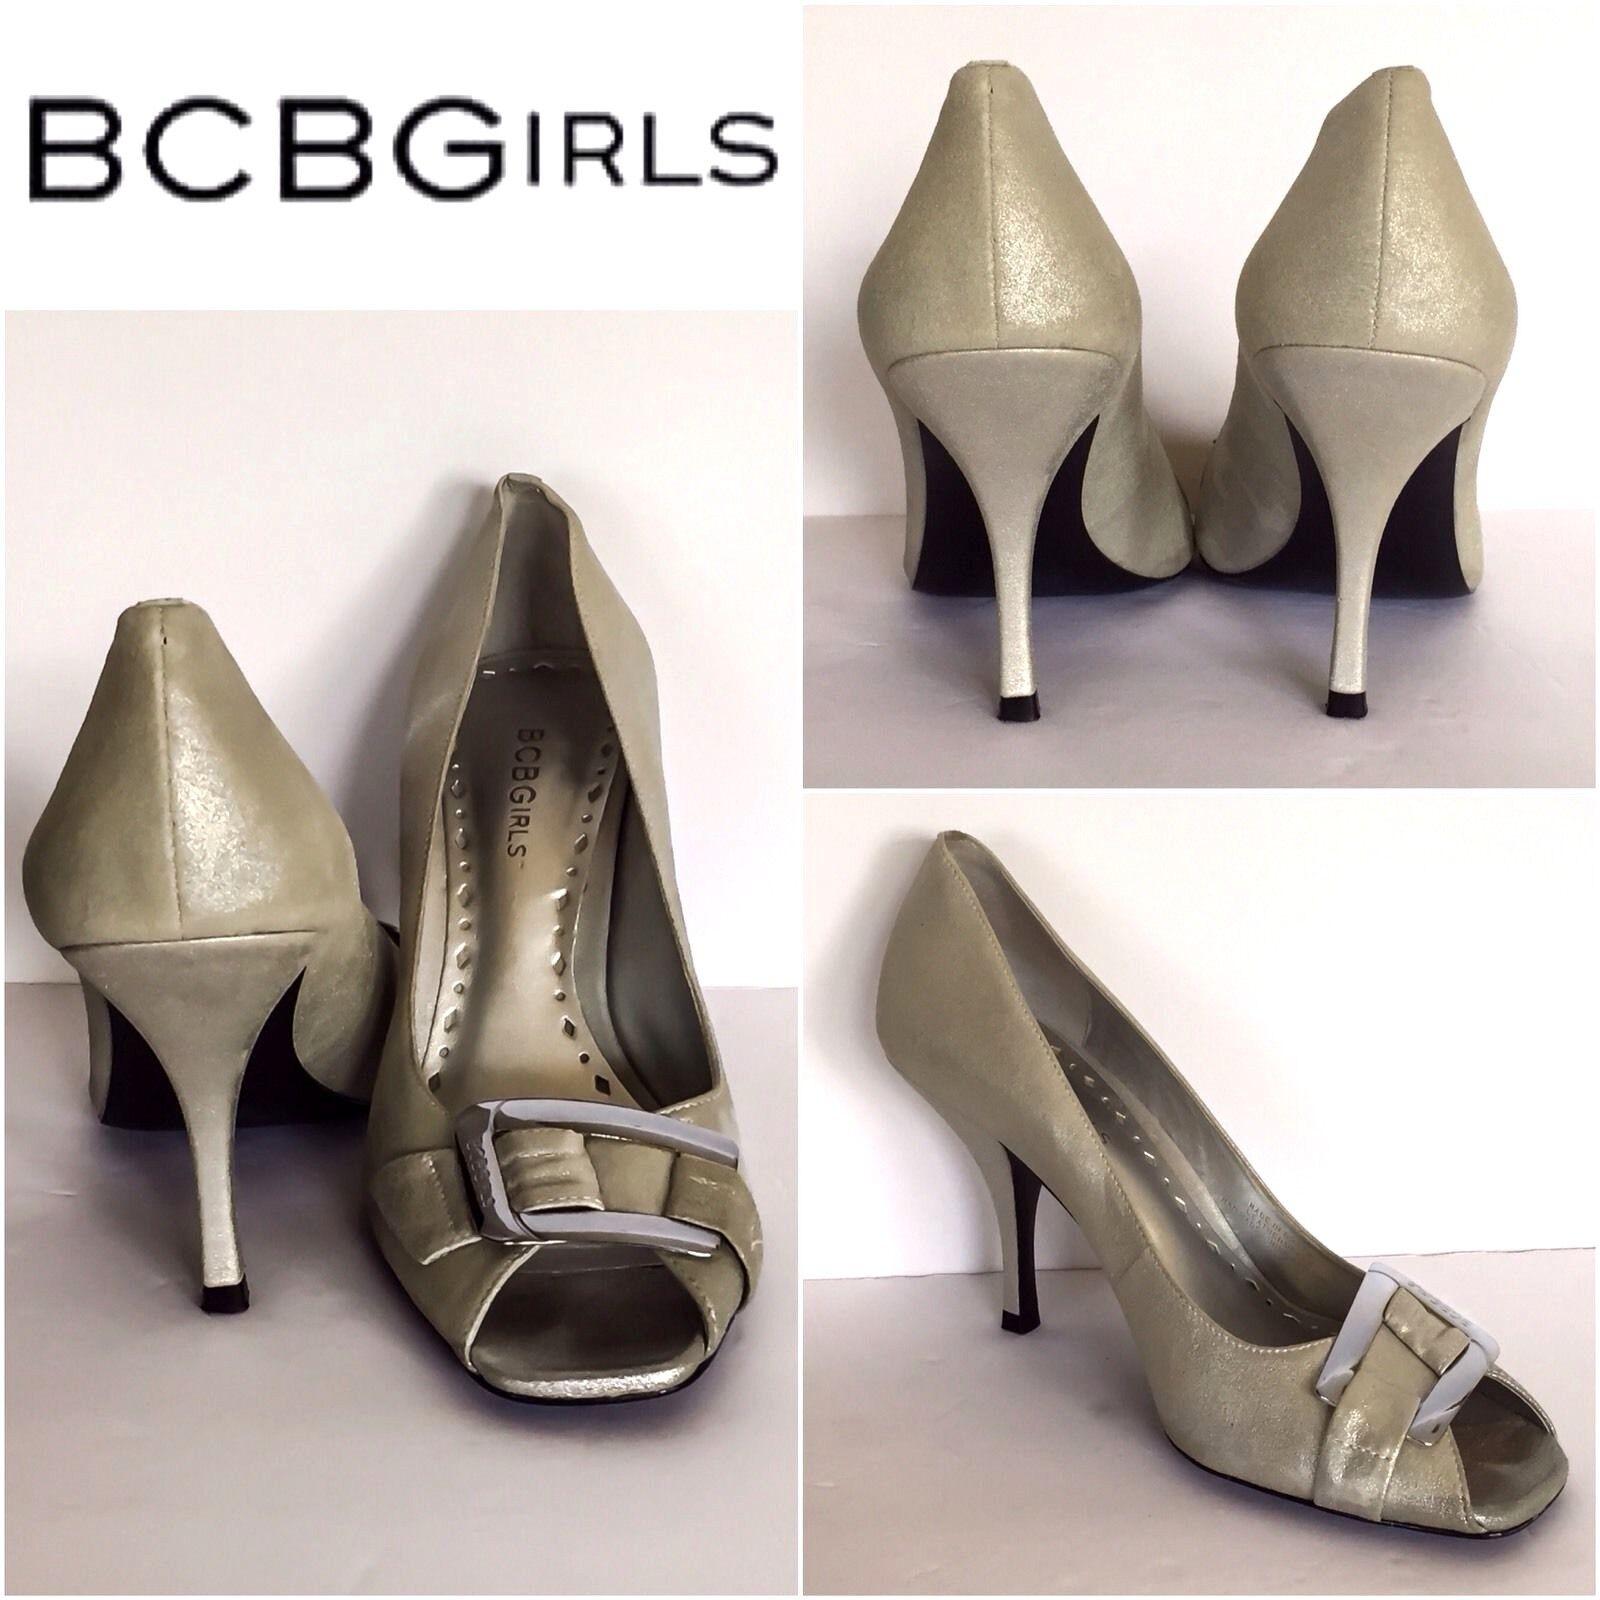 BCBGirls Heels Open Toe Slip On Heels BCBGirls Size 7.5 Womens Metallic Silver Buckle Top cb4b7c